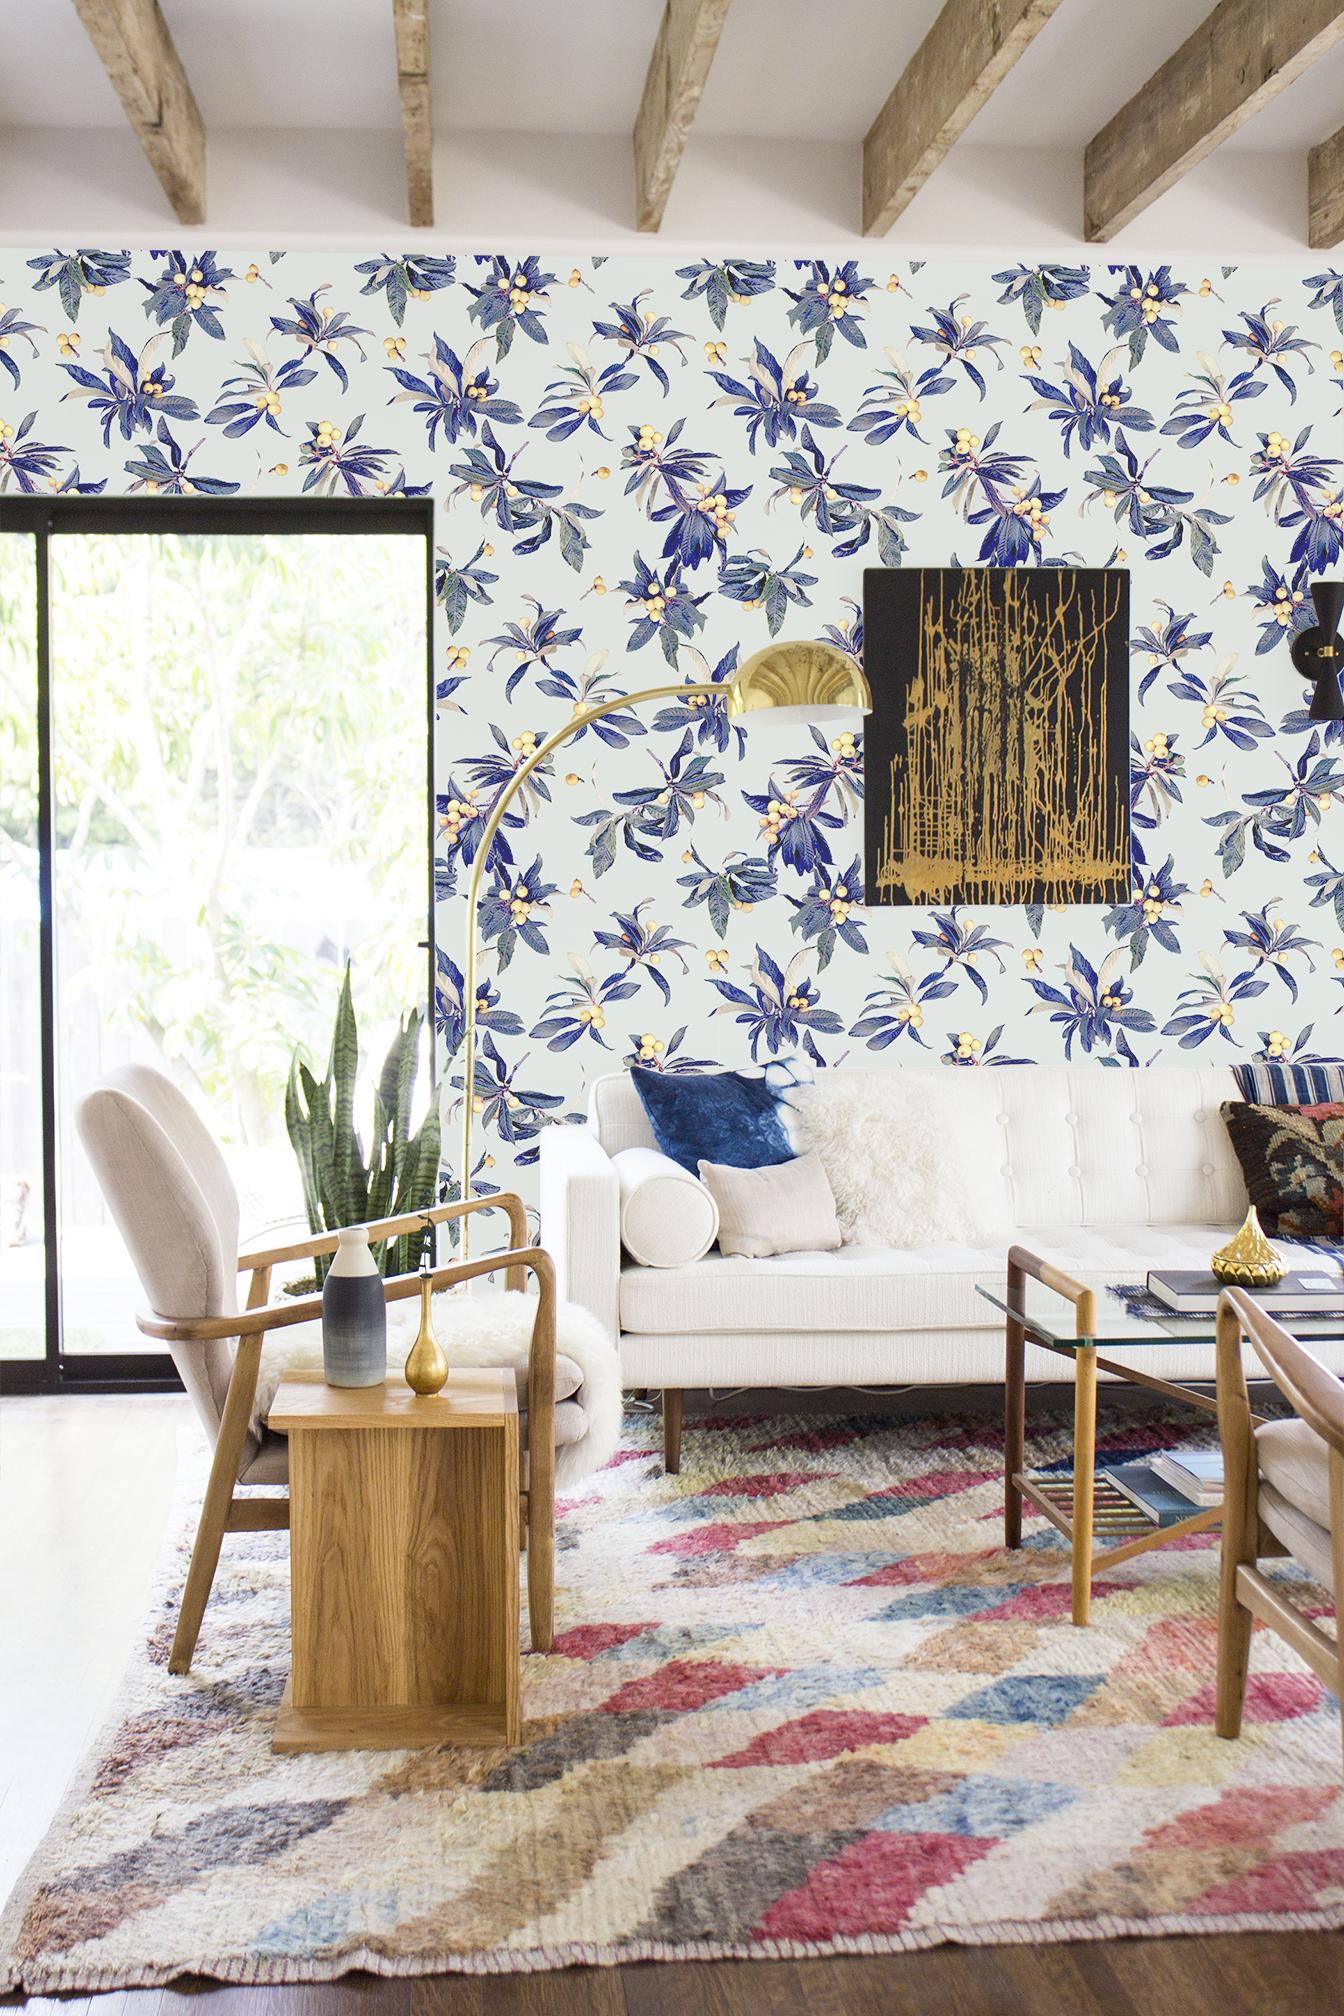 Loquat Love Removable Fabric Wallpaper